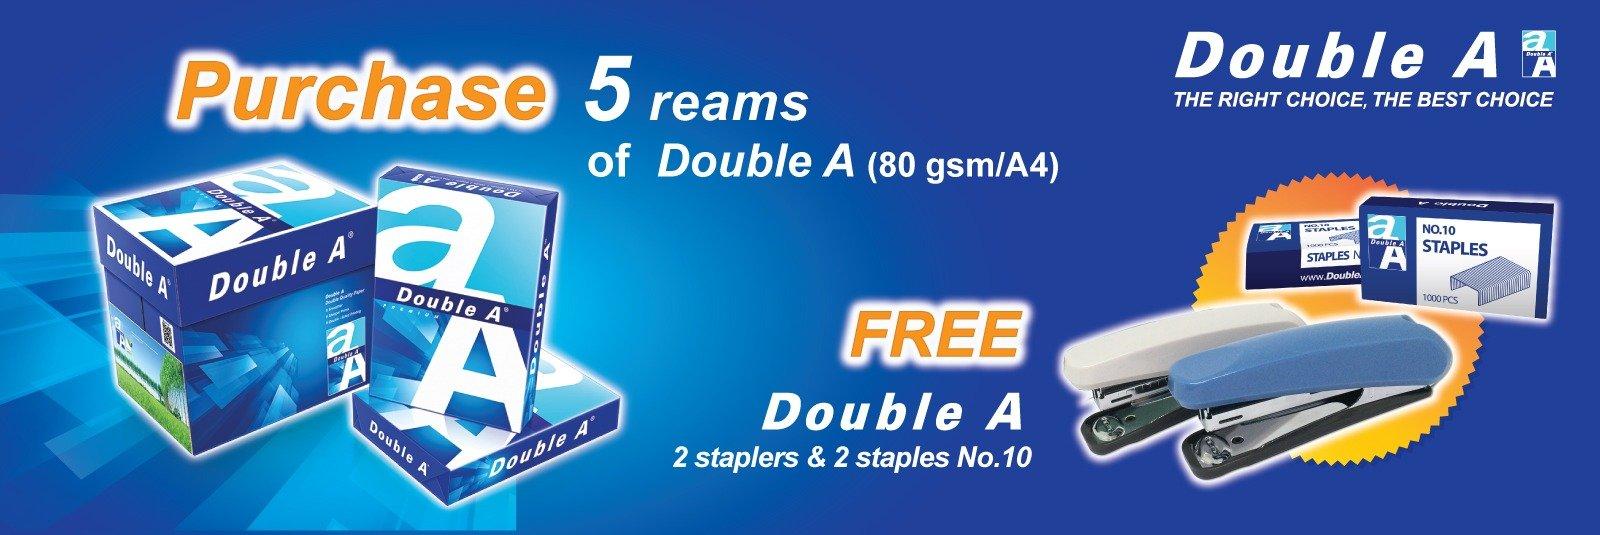 free stapler and refill